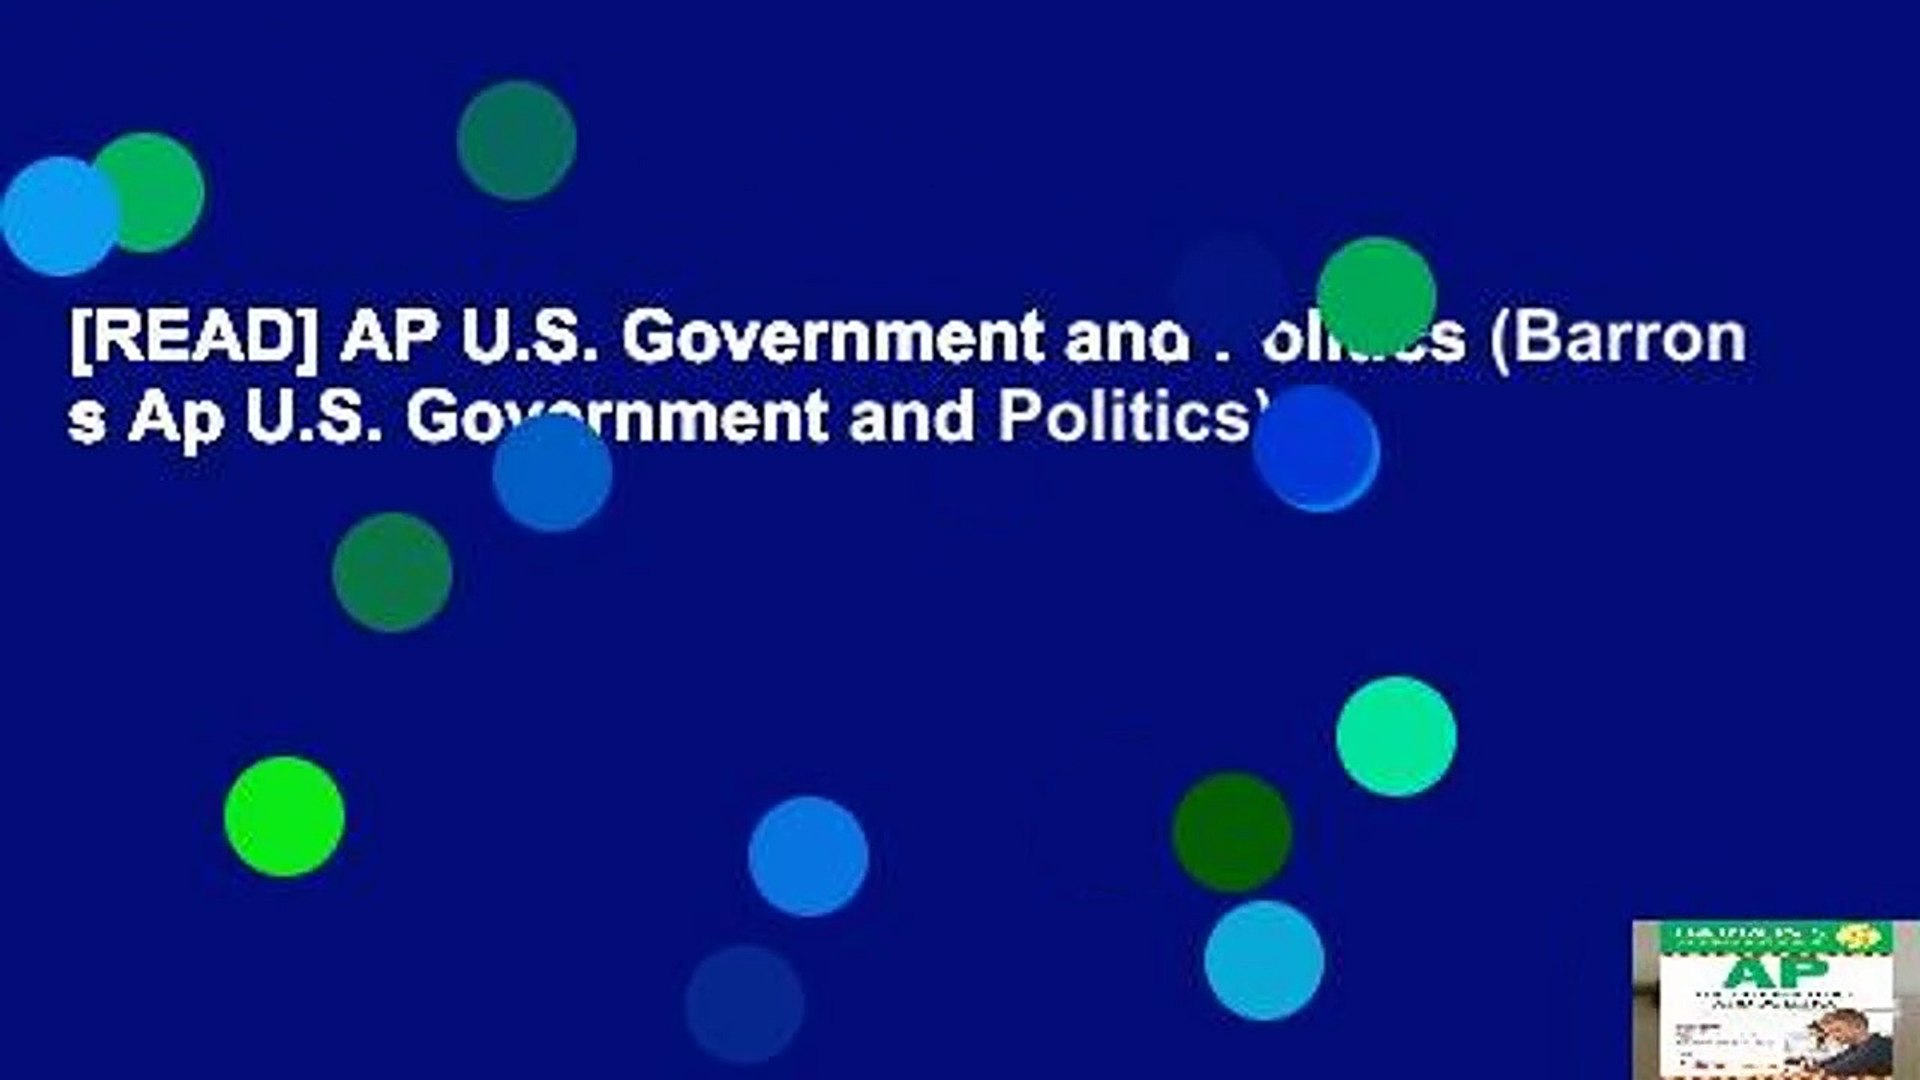 [READ] AP U.S. Government and Politics (Barron s Ap U.S. Government and Politics)